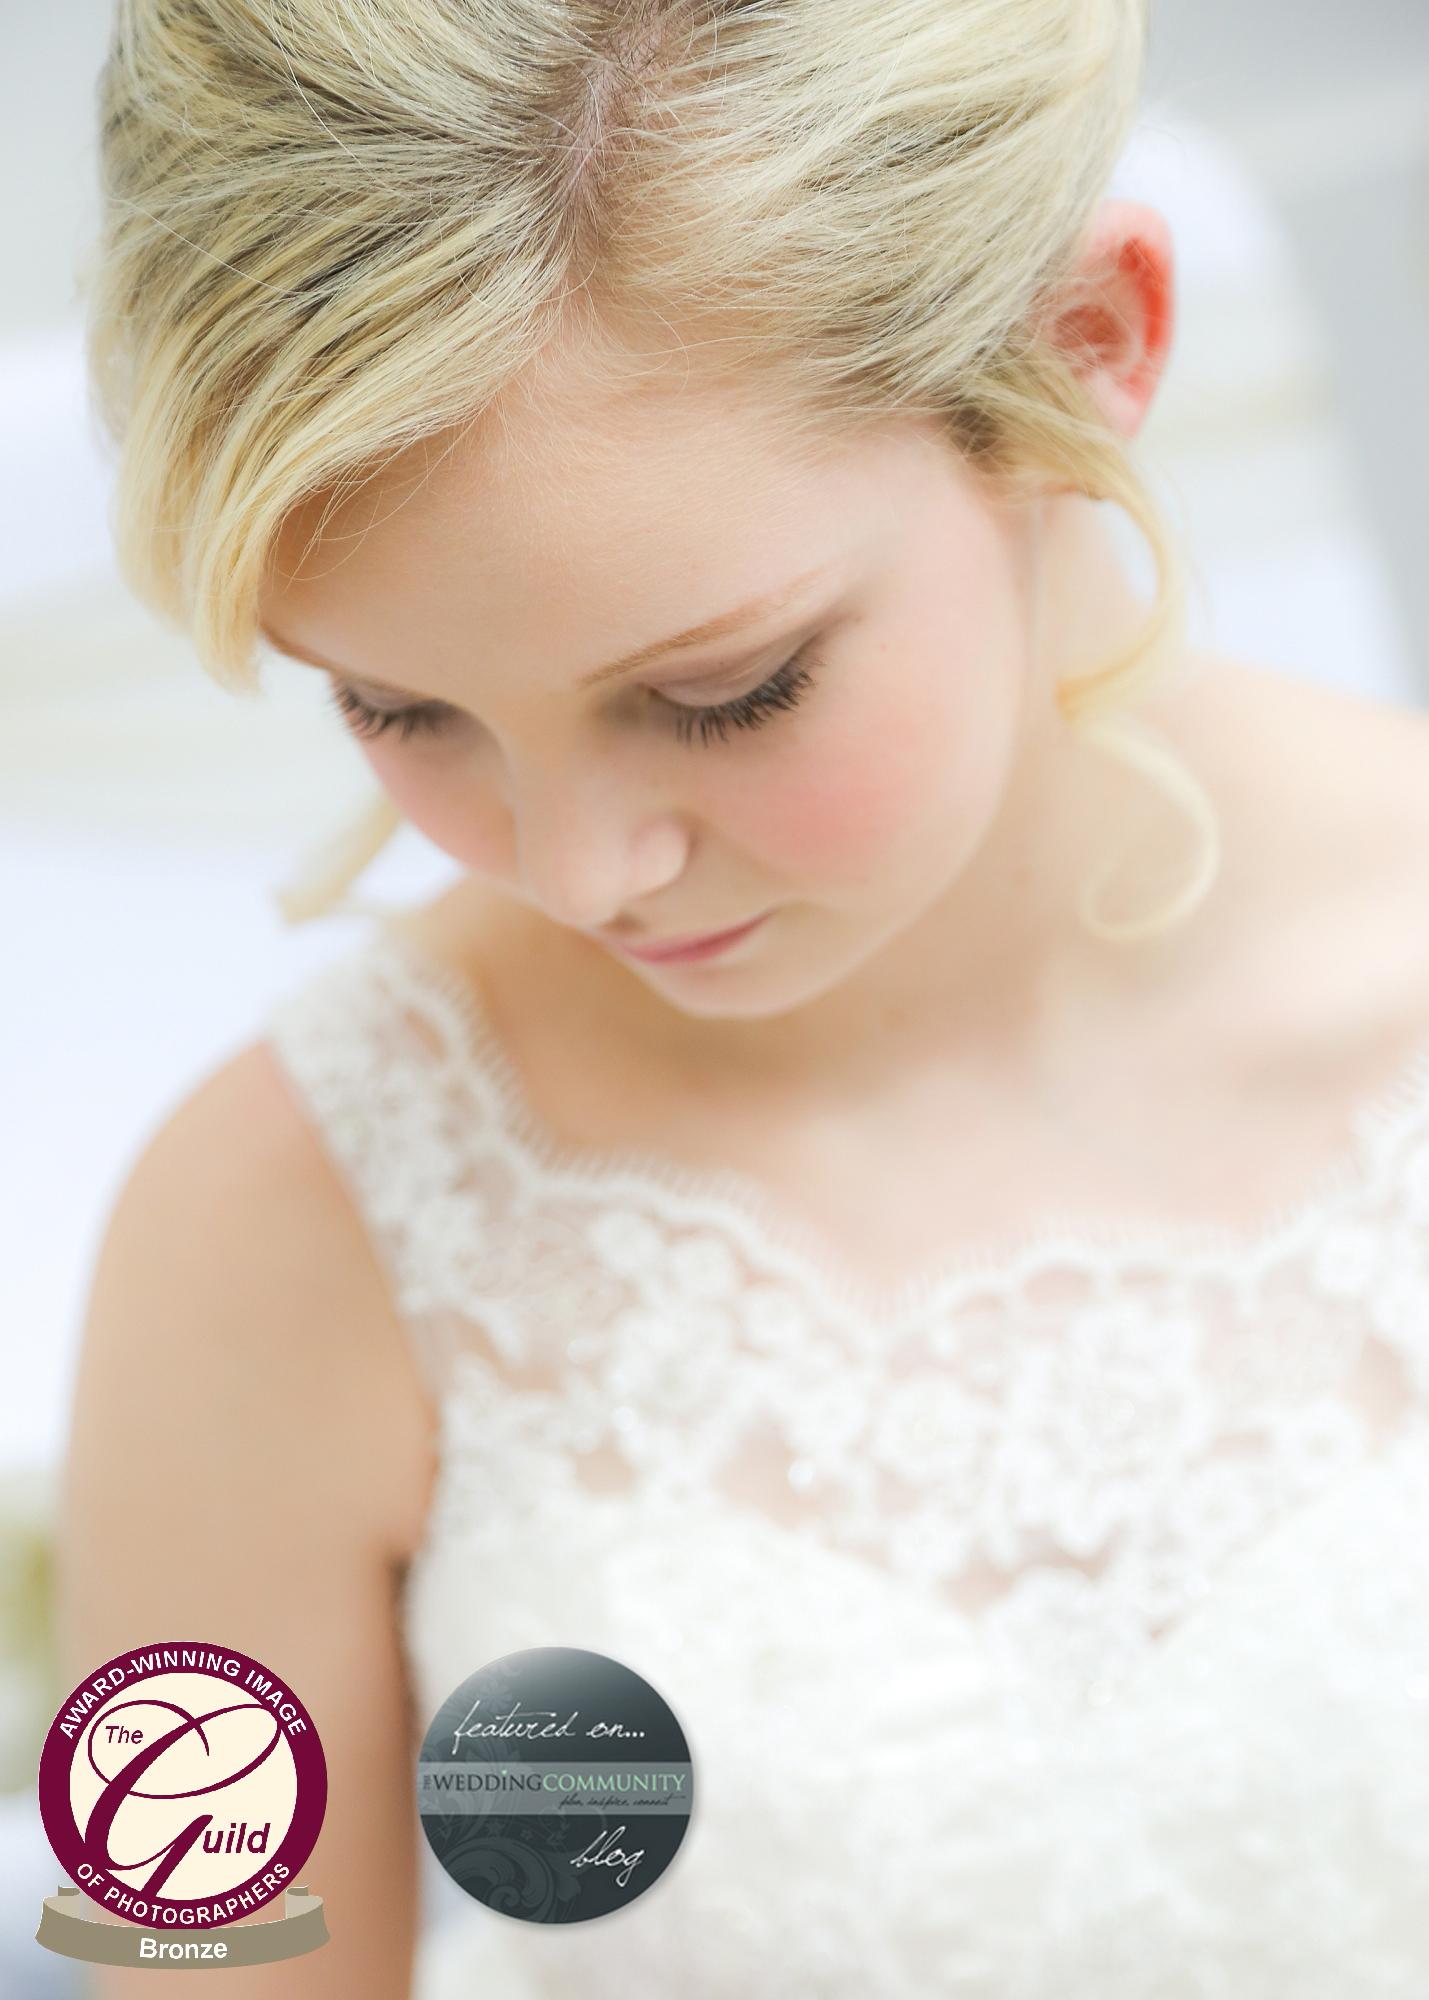 Essex-Portrait-Photographer-Anesta-Broad-Photography_2013.jpg